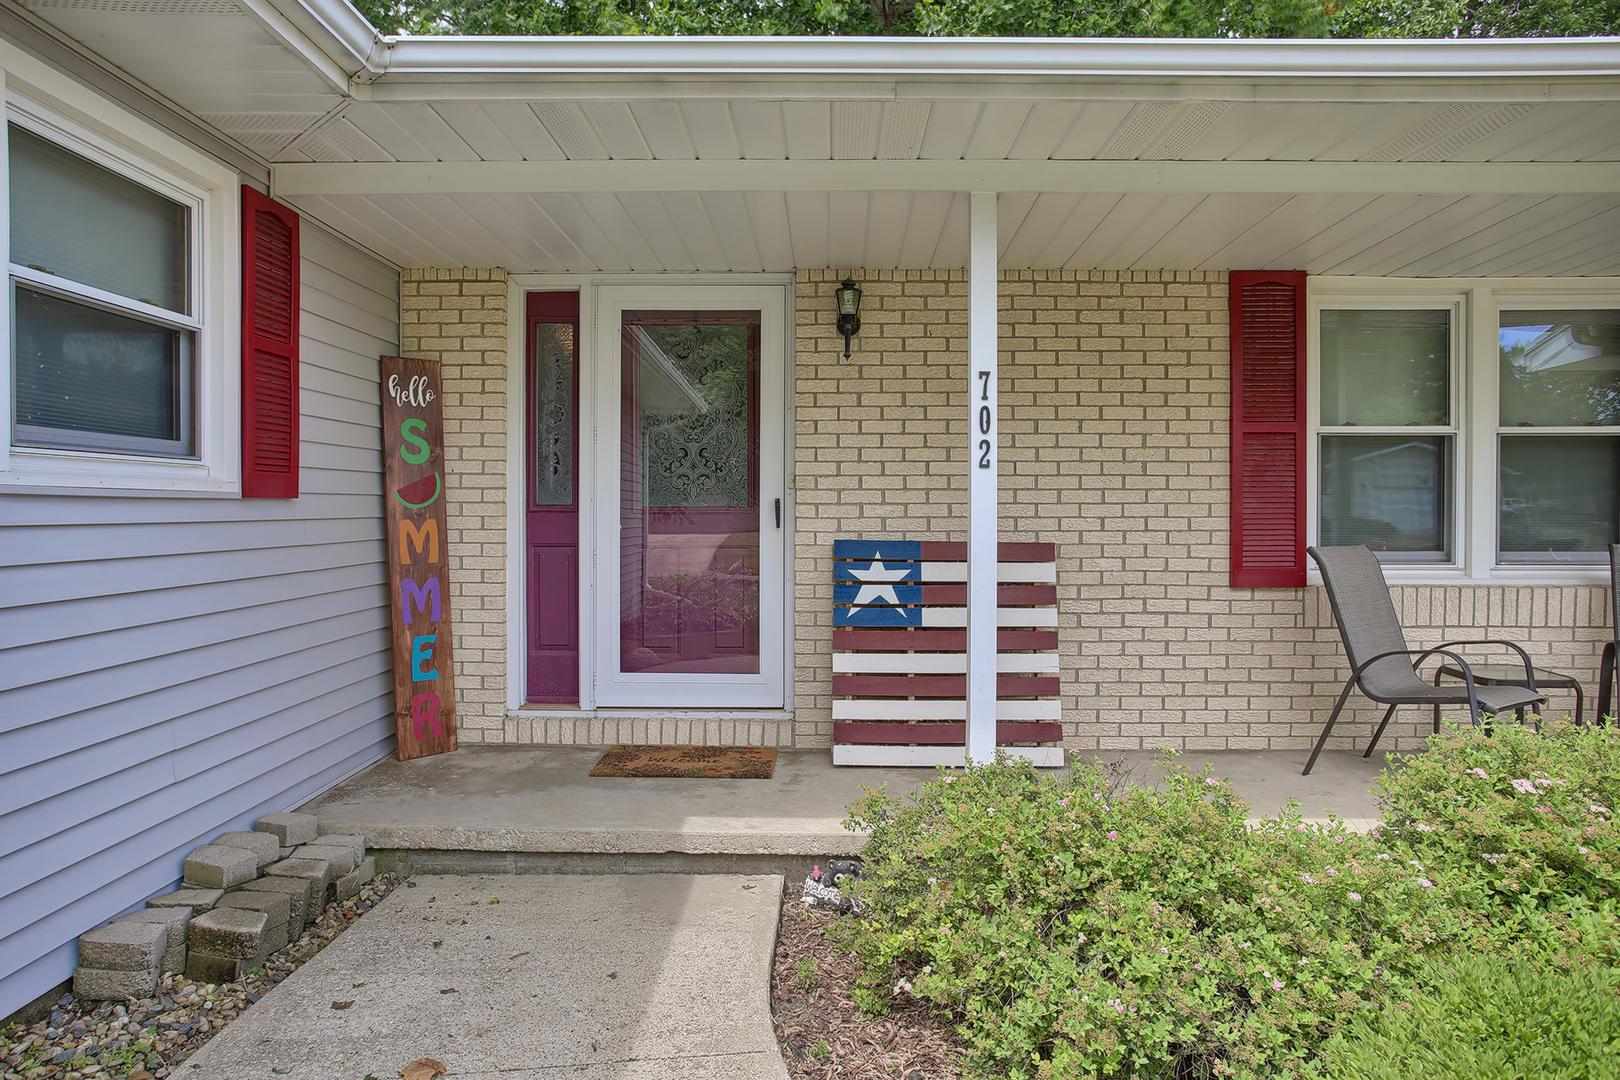 702 Crestview, Monticello, Illinois, 61856